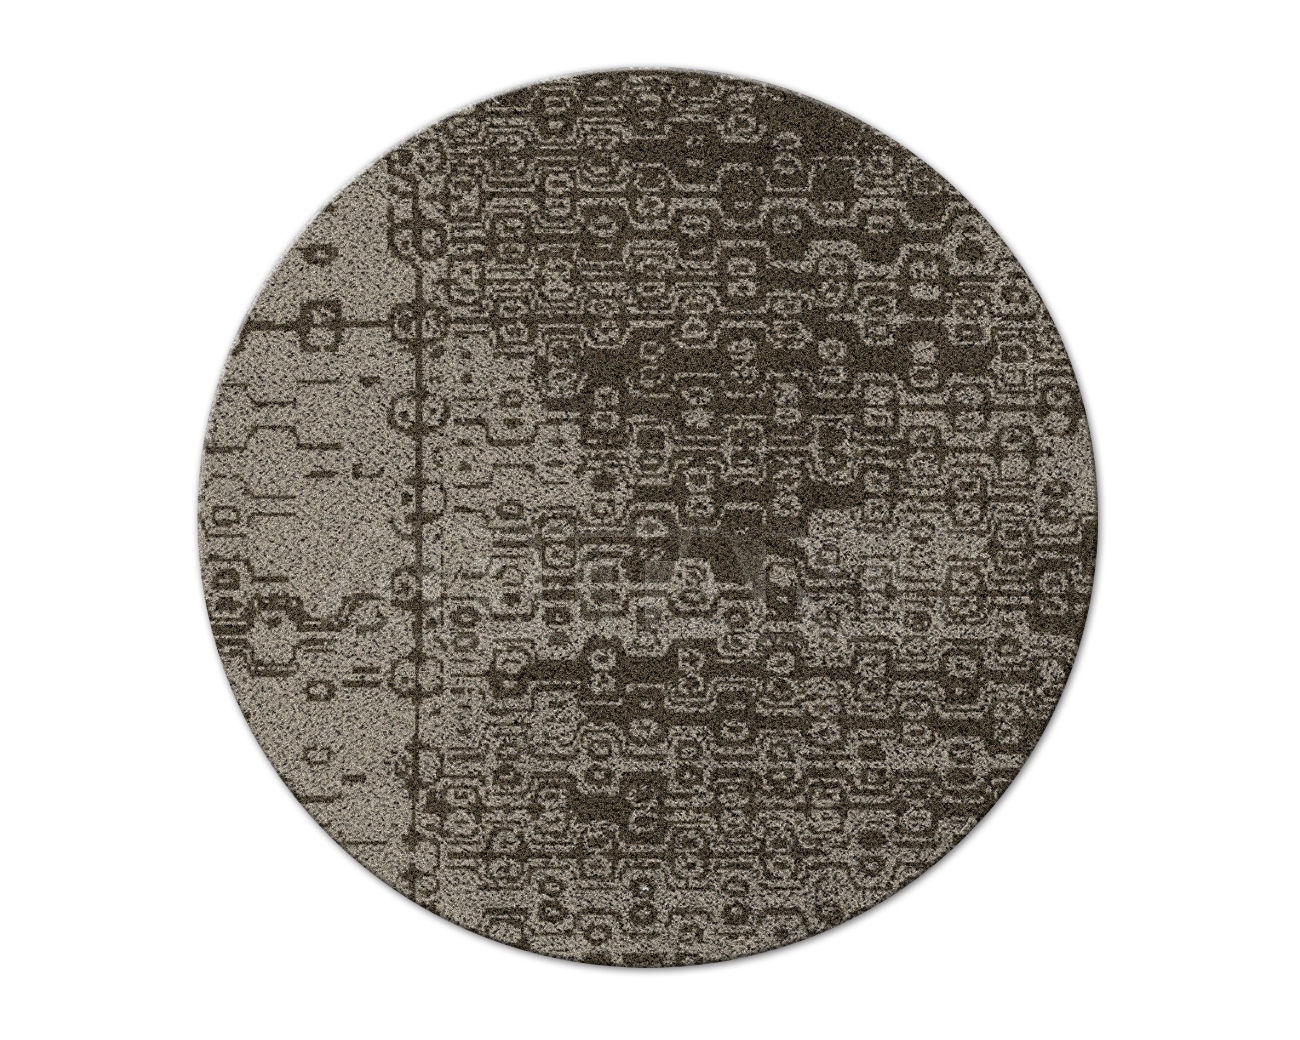 Купить Ковер современный Brabbu by Covet Lounge Rugs IGBO | RUG II